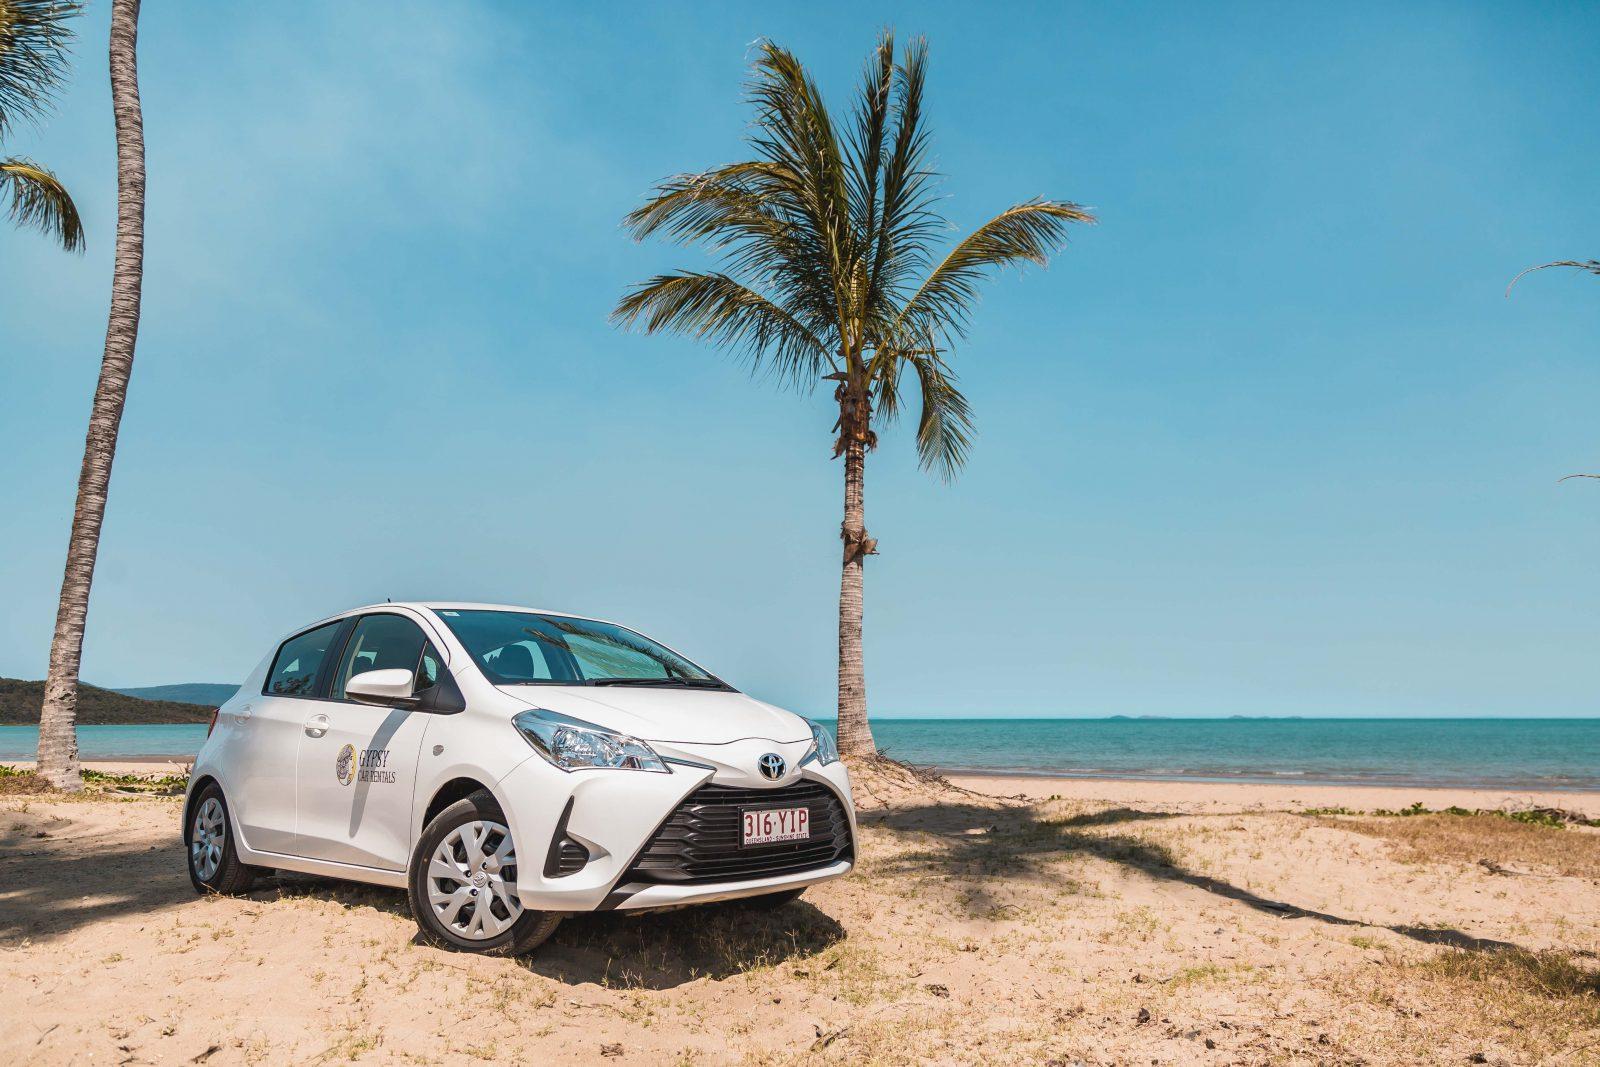 Car Hire Airlie Beach, Car Rental Airlie Beach, Whitsunday Car Hire and Rental